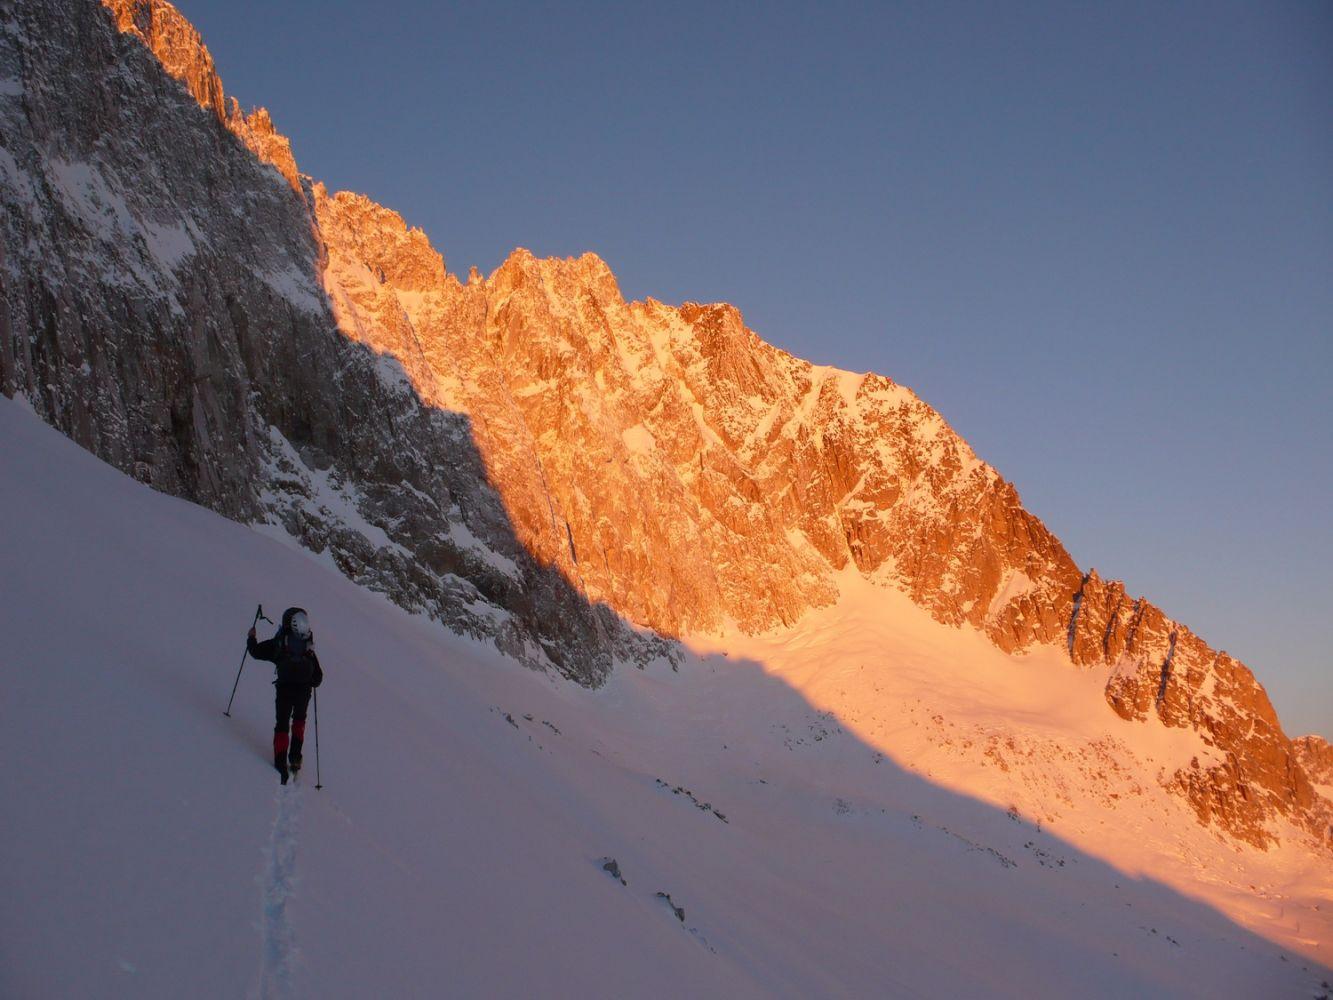 alpinisme_hiver_afdv_06